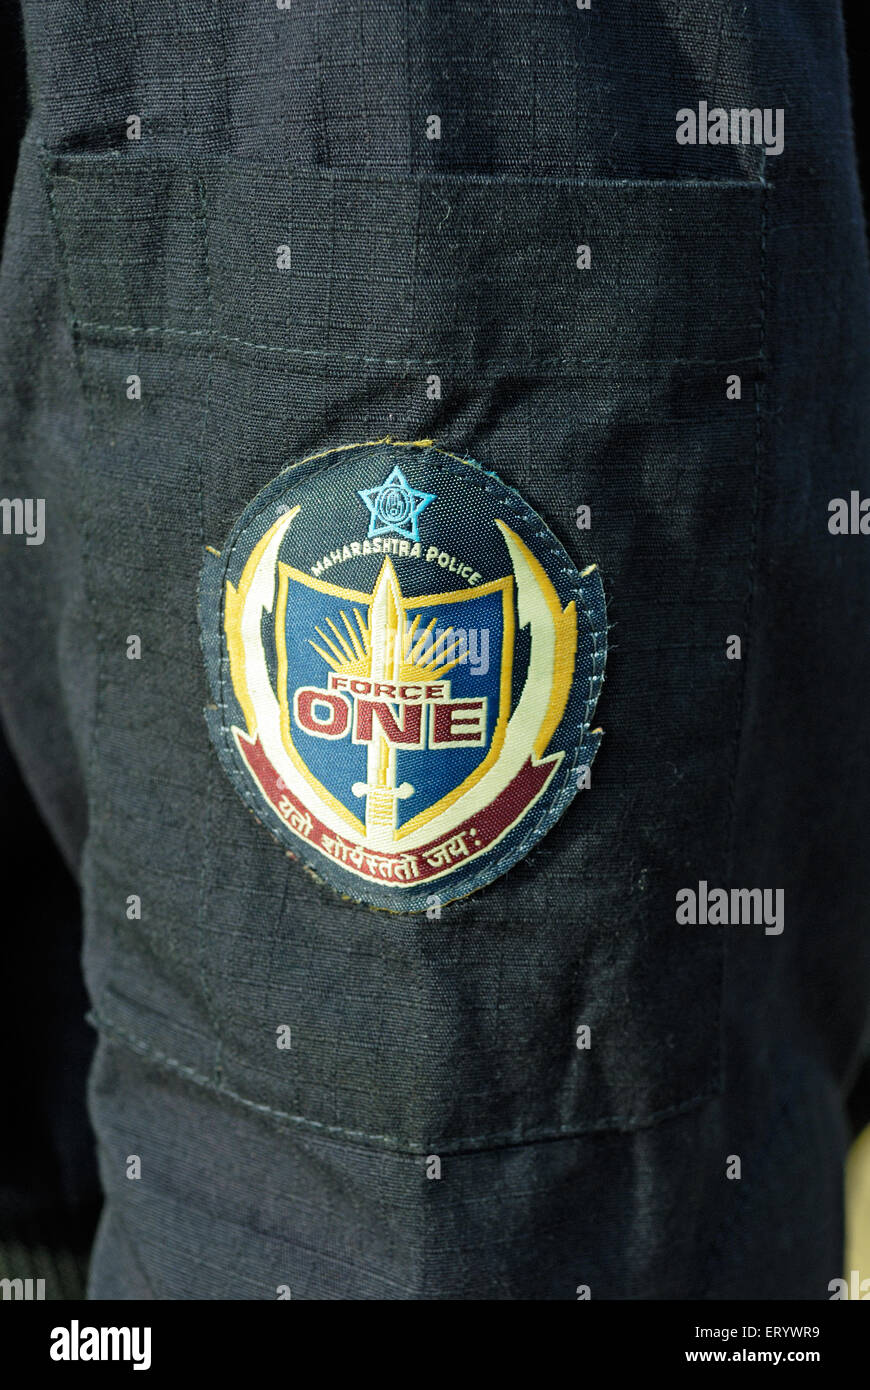 Logo de commando de police connu sous le nom de force 1 Bombay Mumbai Maharashtra; Inde; Photo Stock